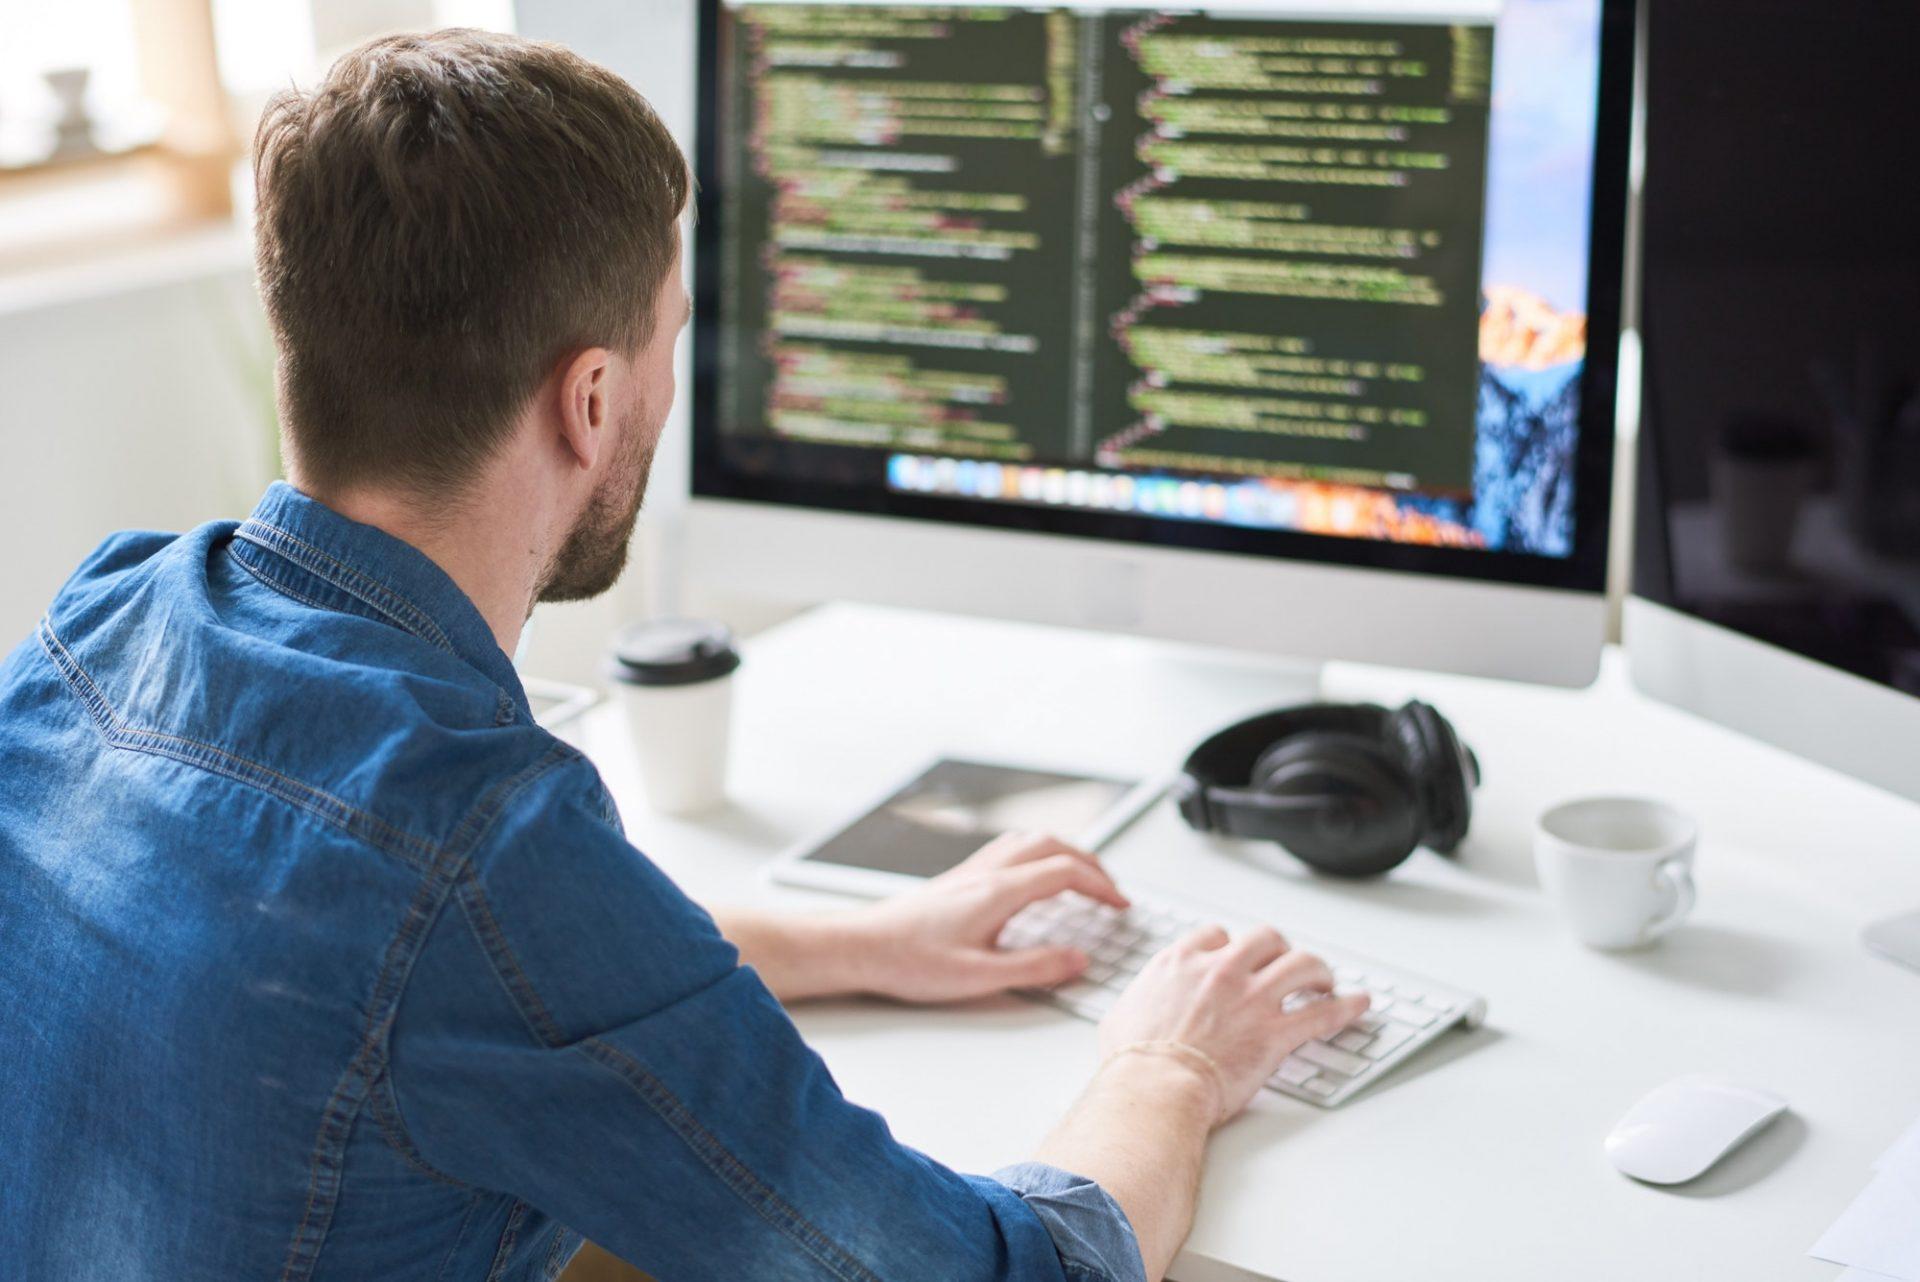 Web Developer Busy Working